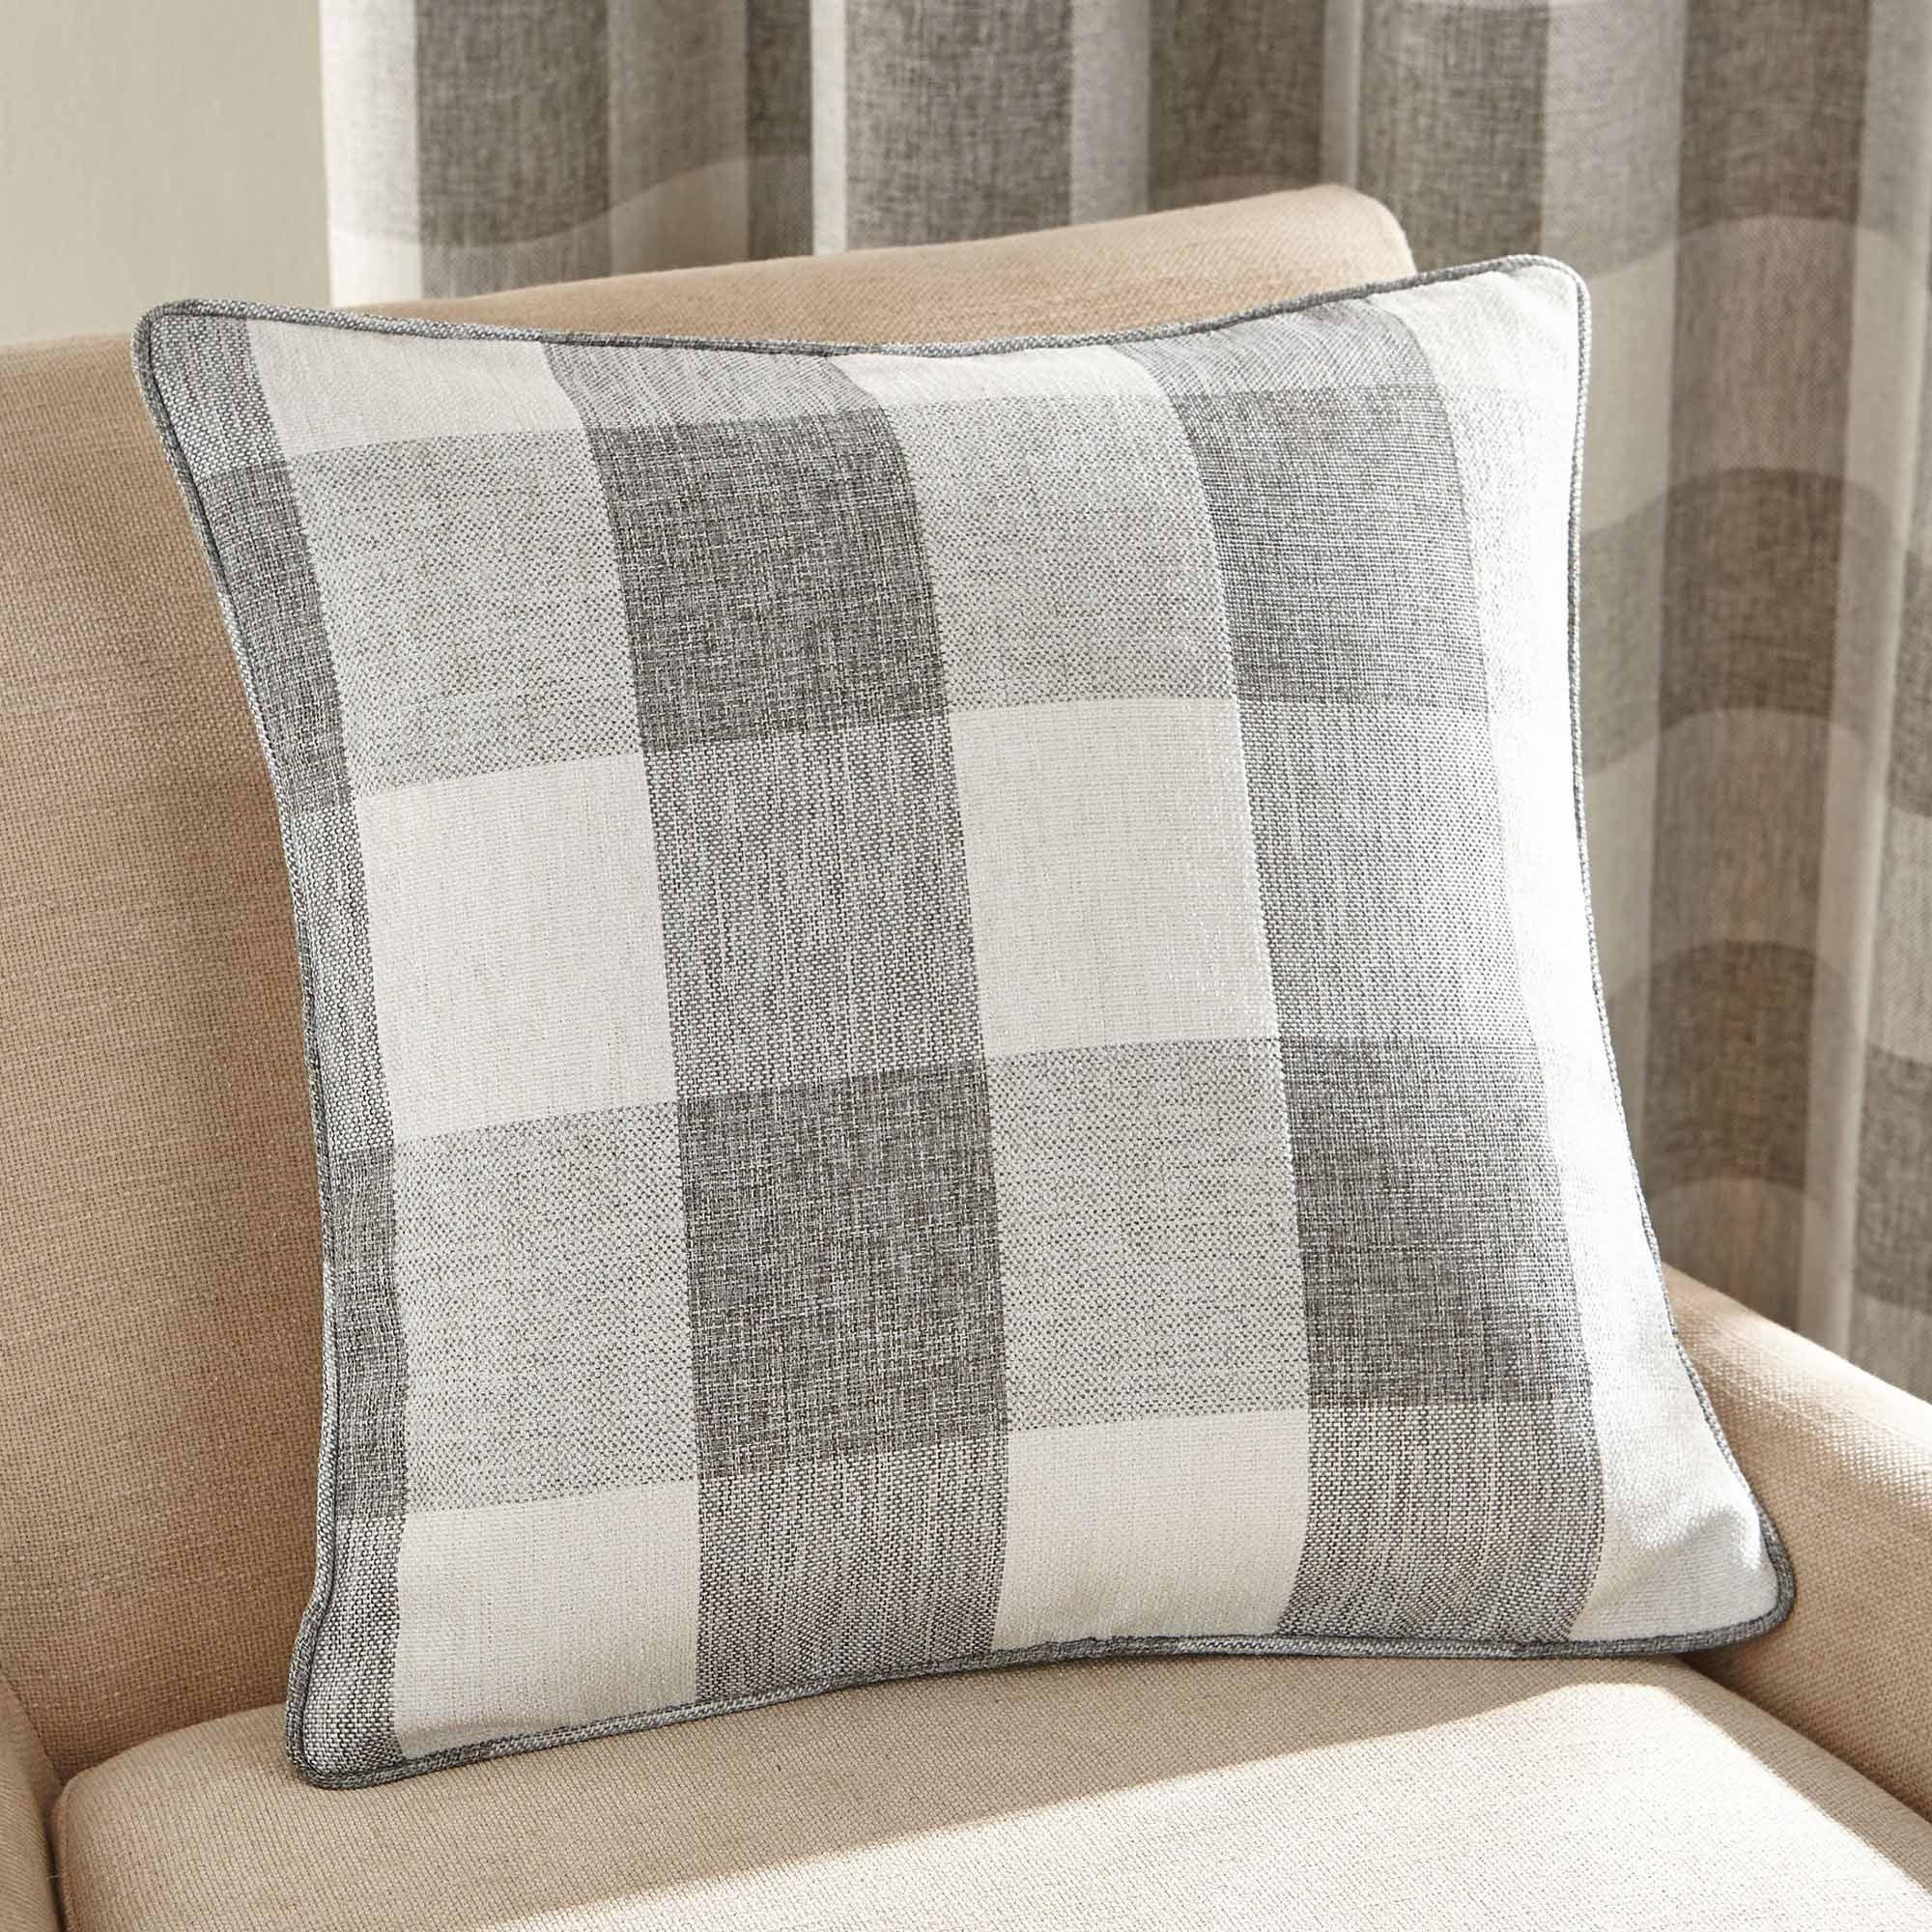 Photo of Natural skye square cushion light brown / natural